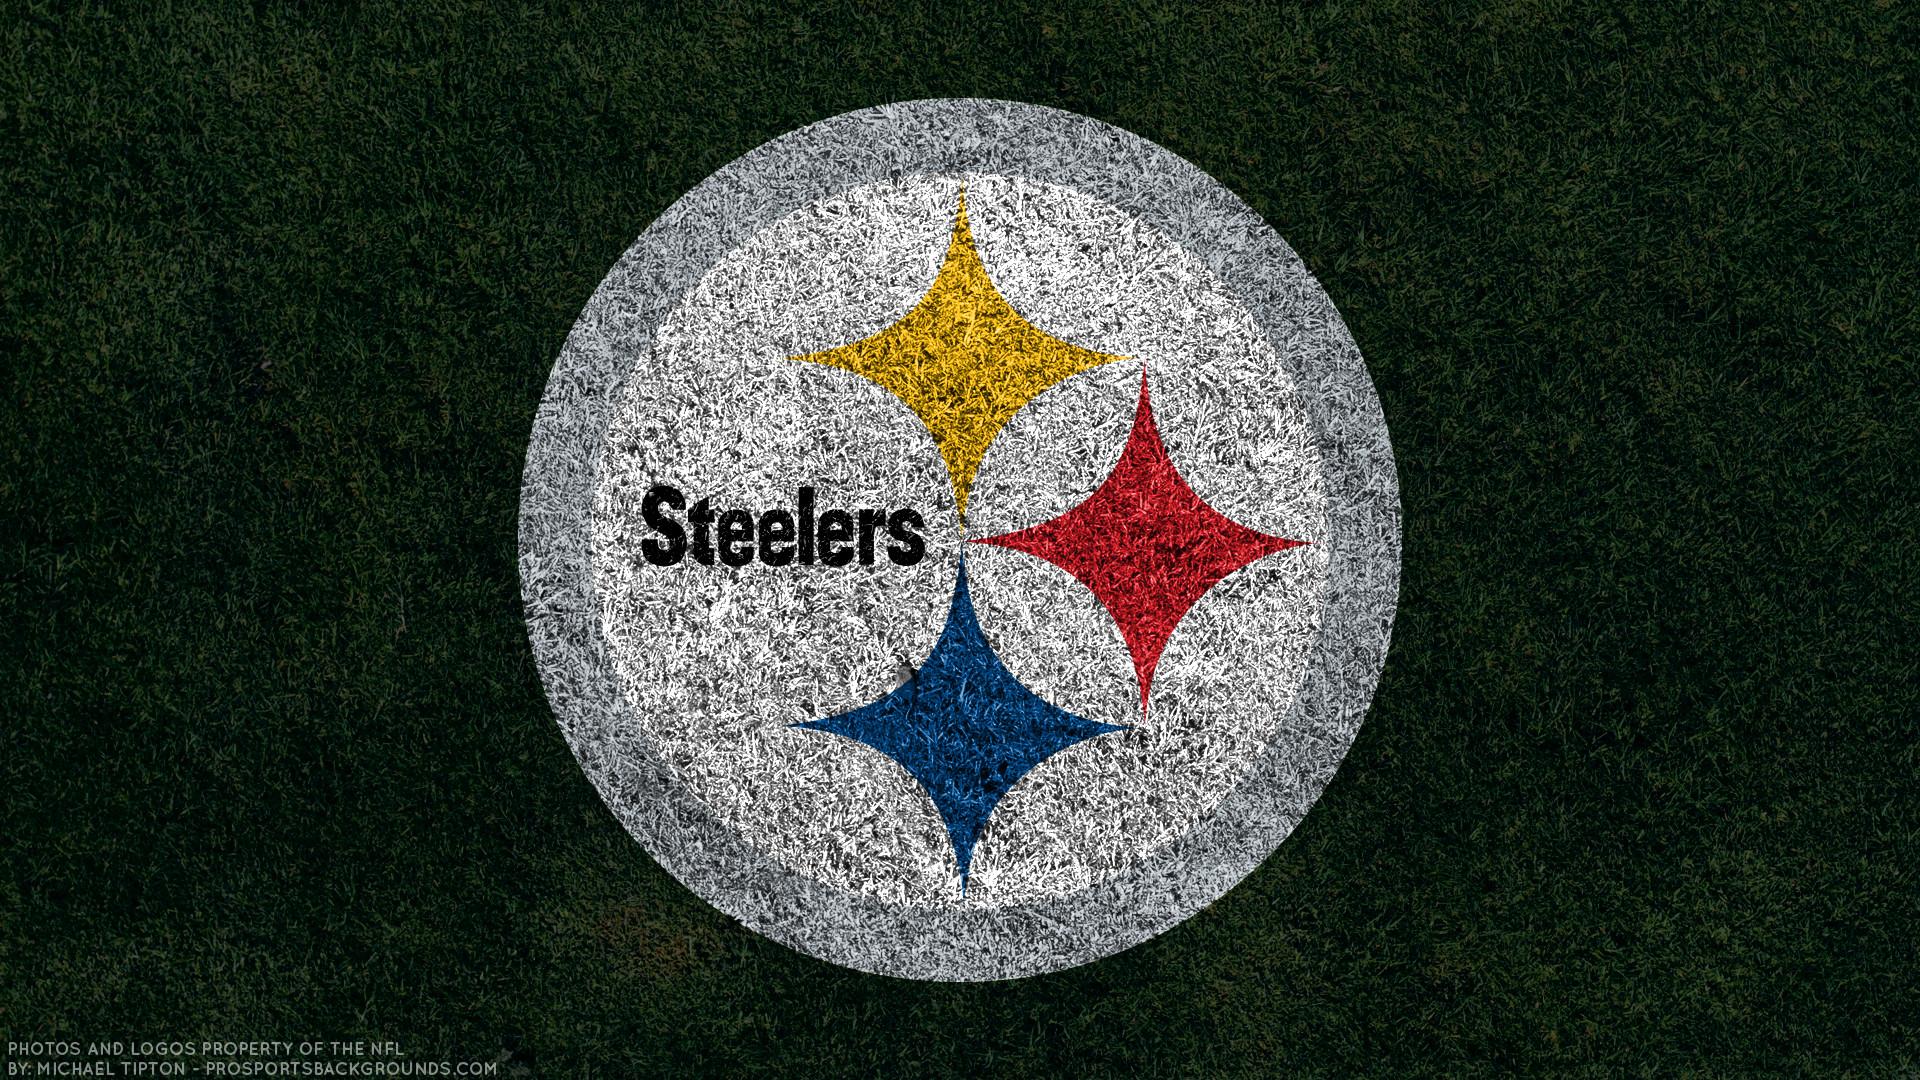 Steeler background 72 images - Steelers background ...